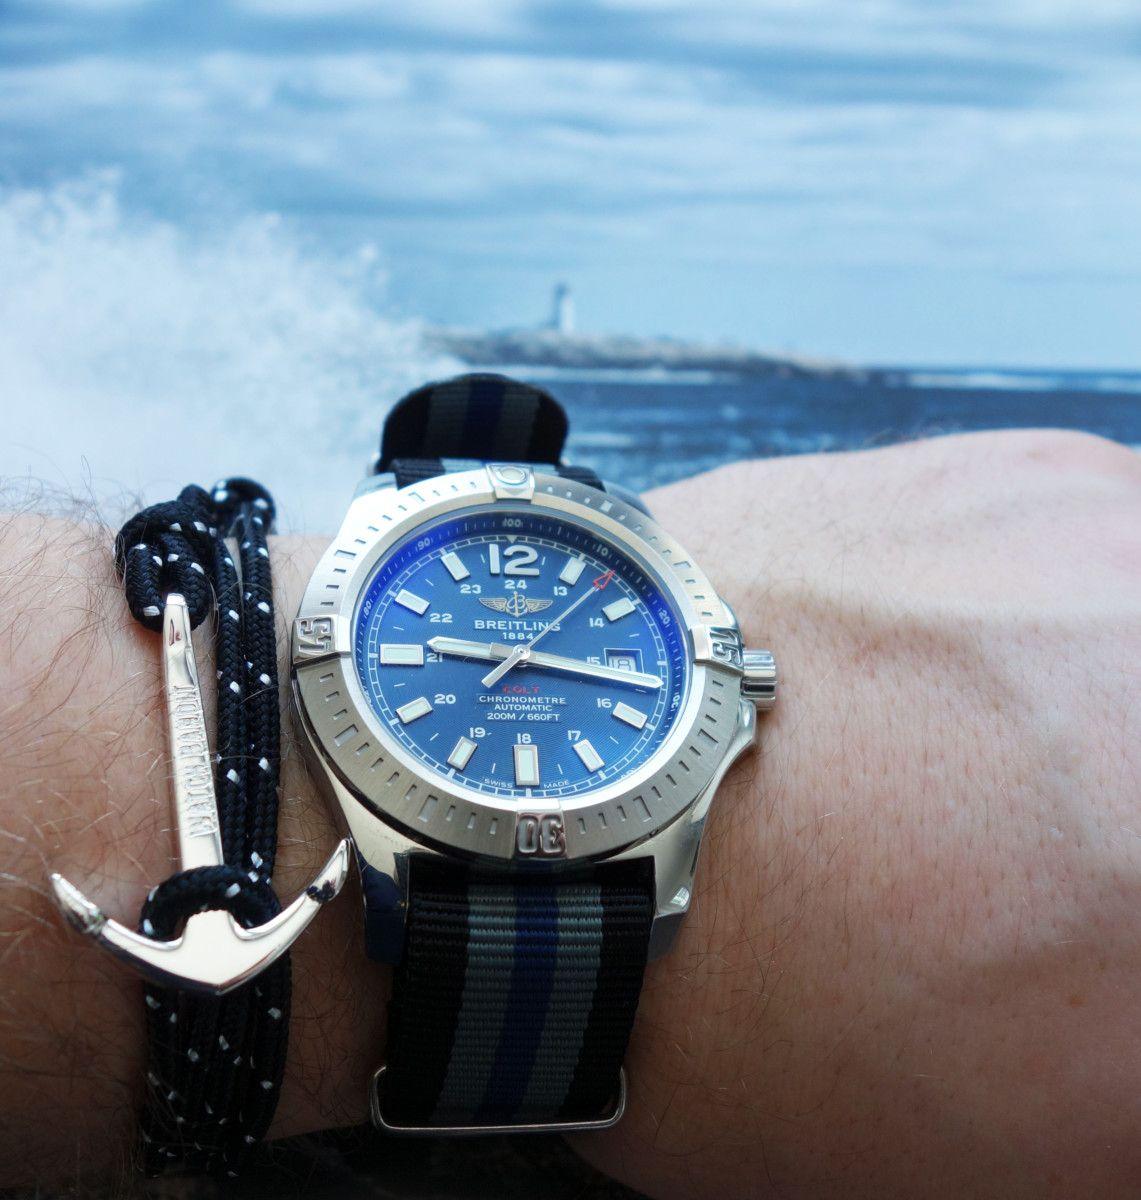 Watchbandit Anker Armband Anchor Bracelet Schwarz Black Uhrenarmbander Armband Uhren